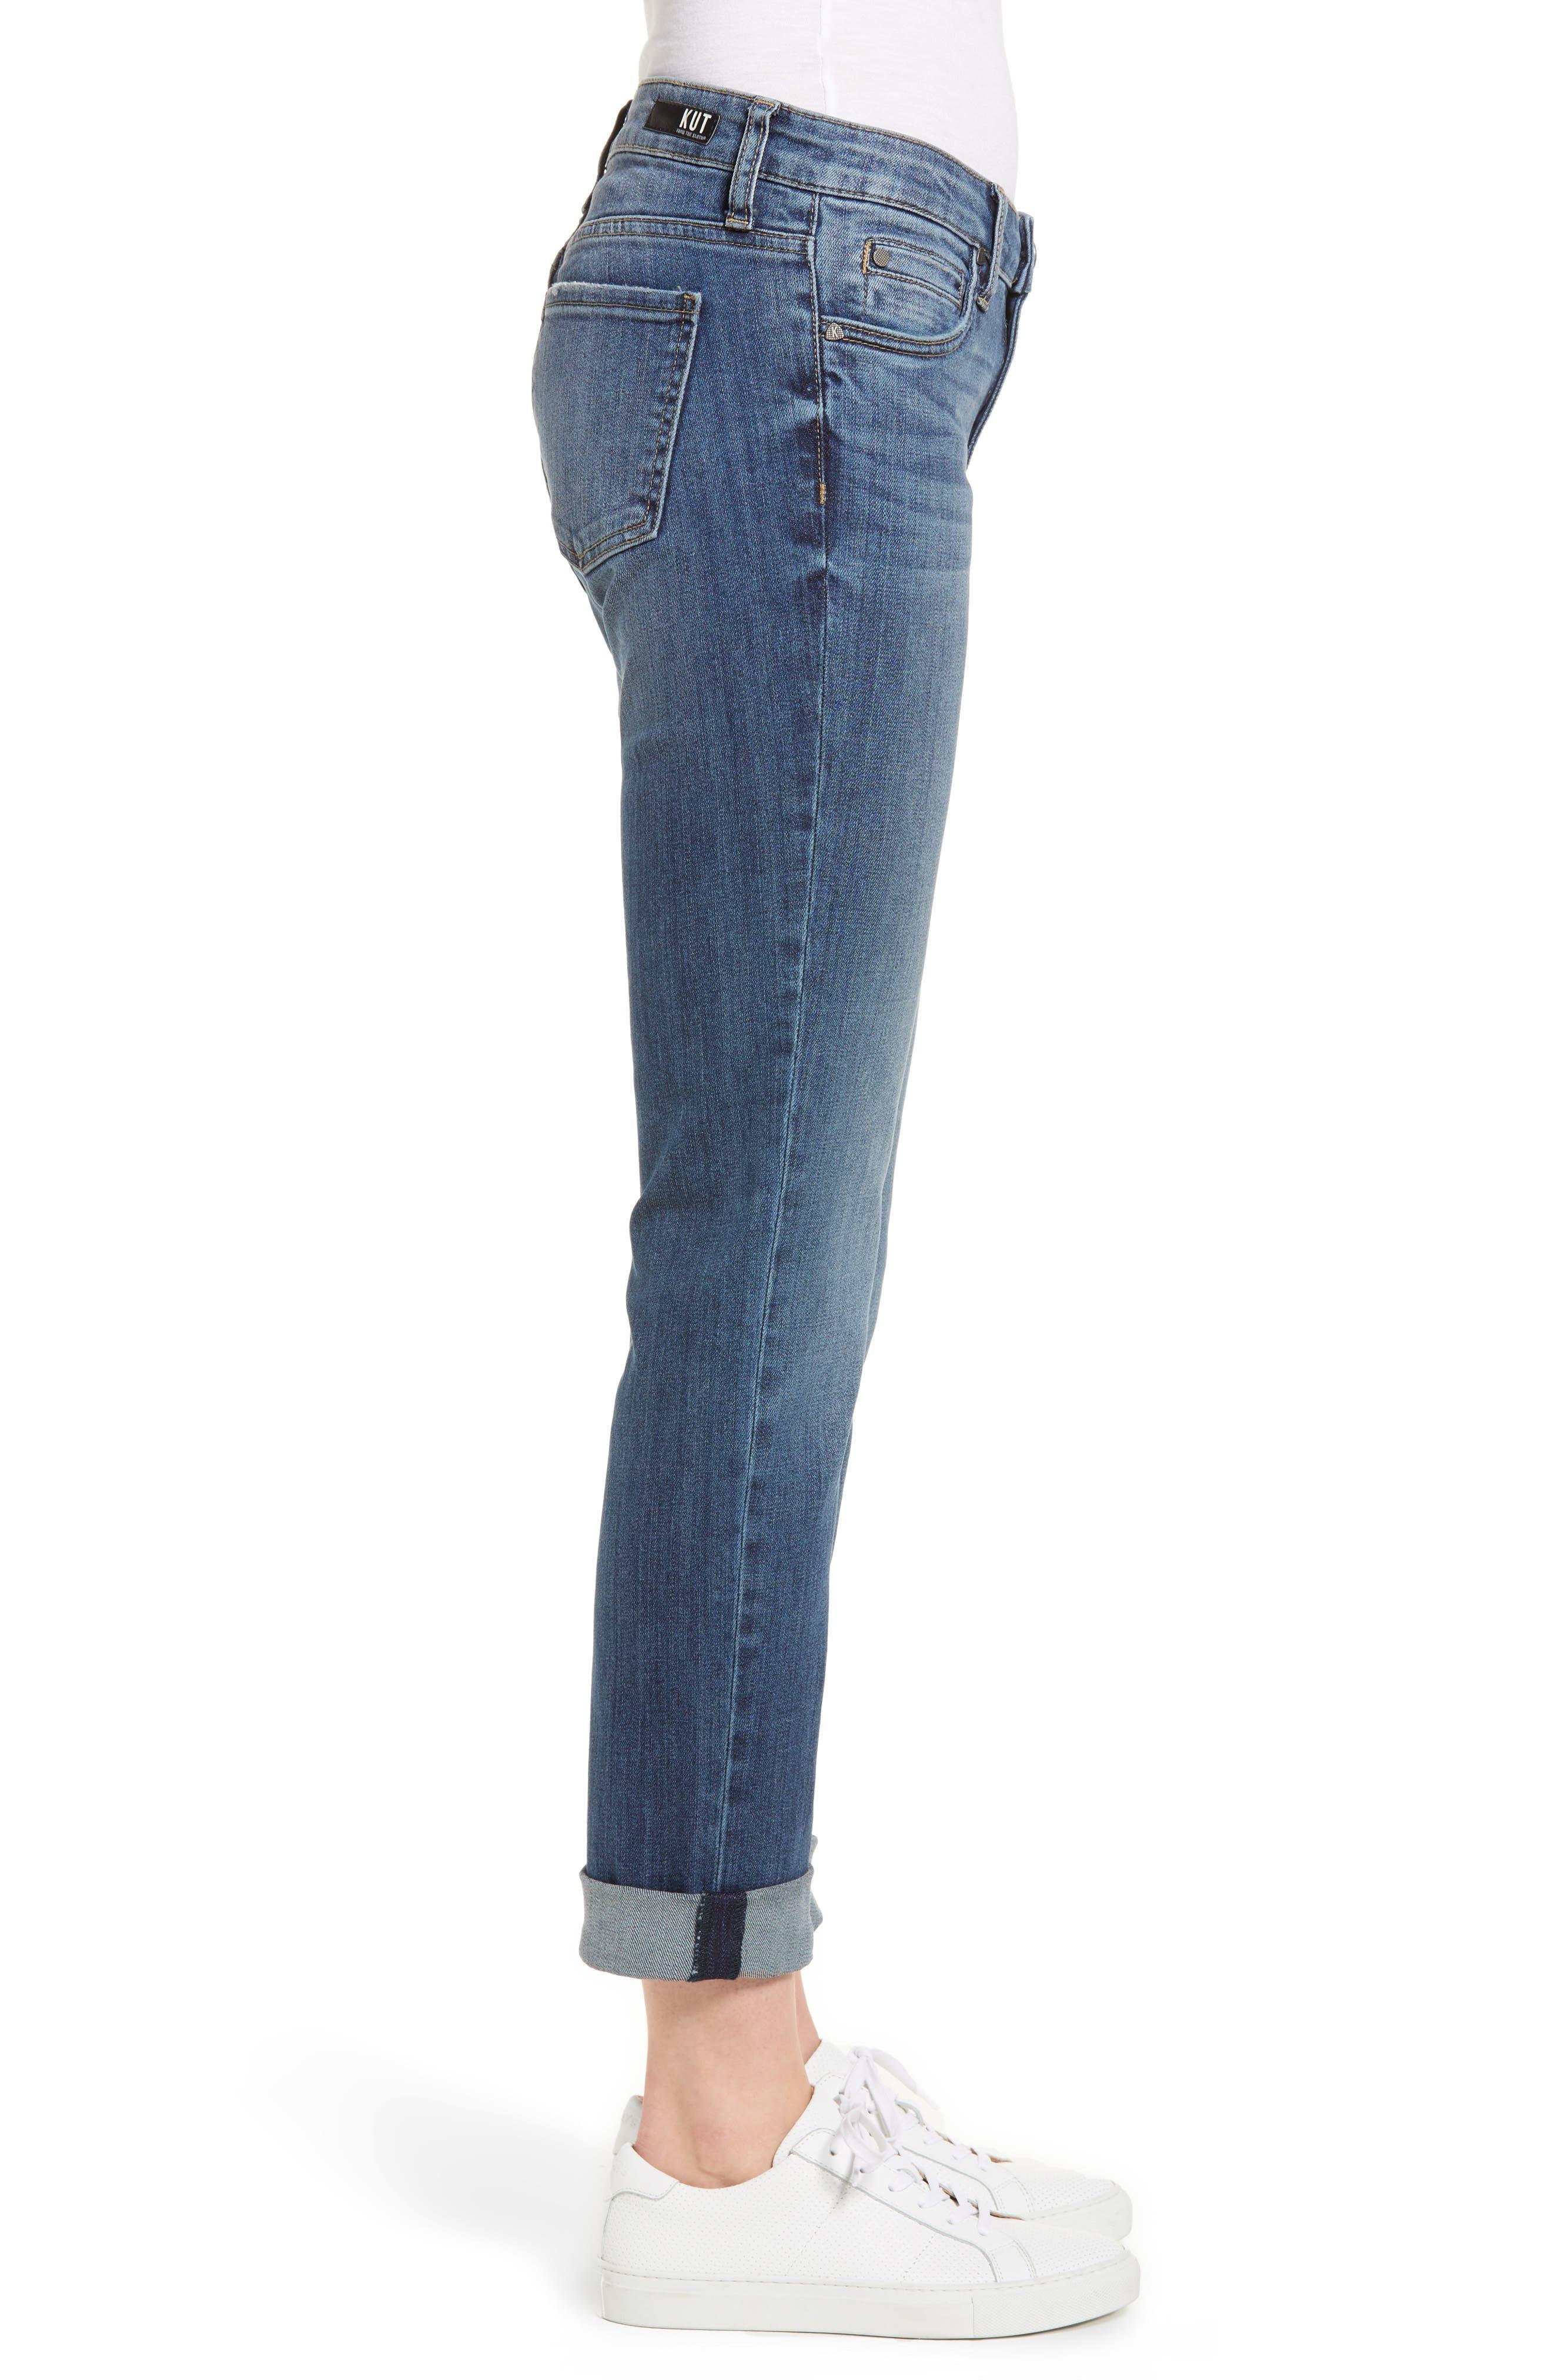 Catherine Boyfriend Jeans,                             Alternate thumbnail 3, color,                             415